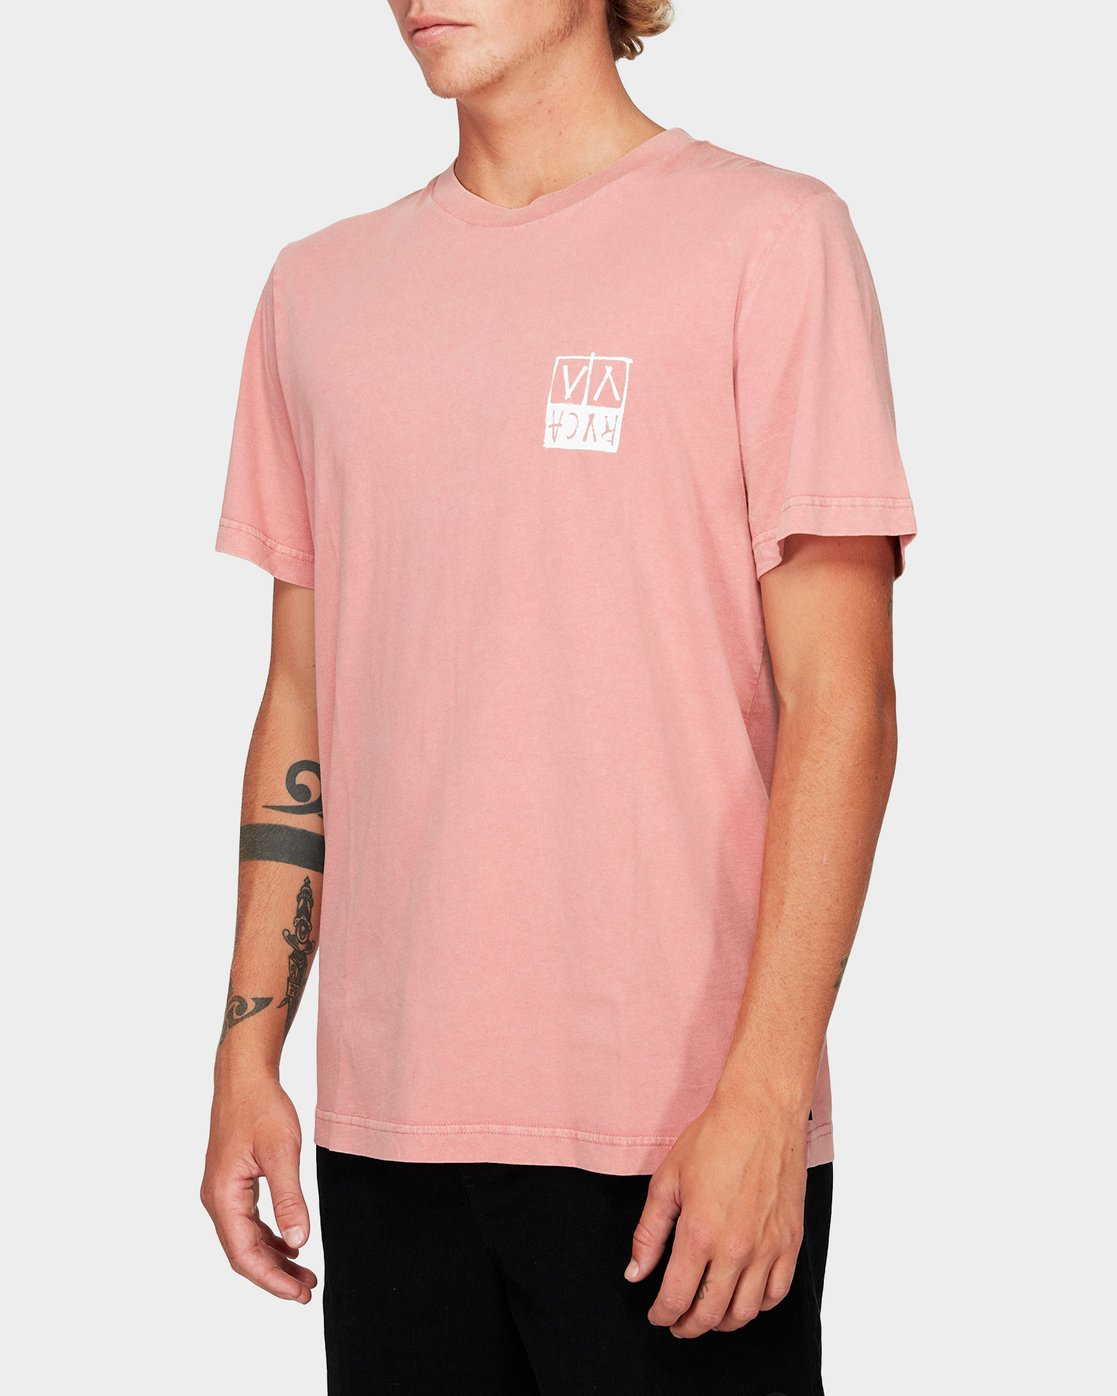 1 RVCA Unplugged Short Sleeve T-Shirt  R192041 RVCA